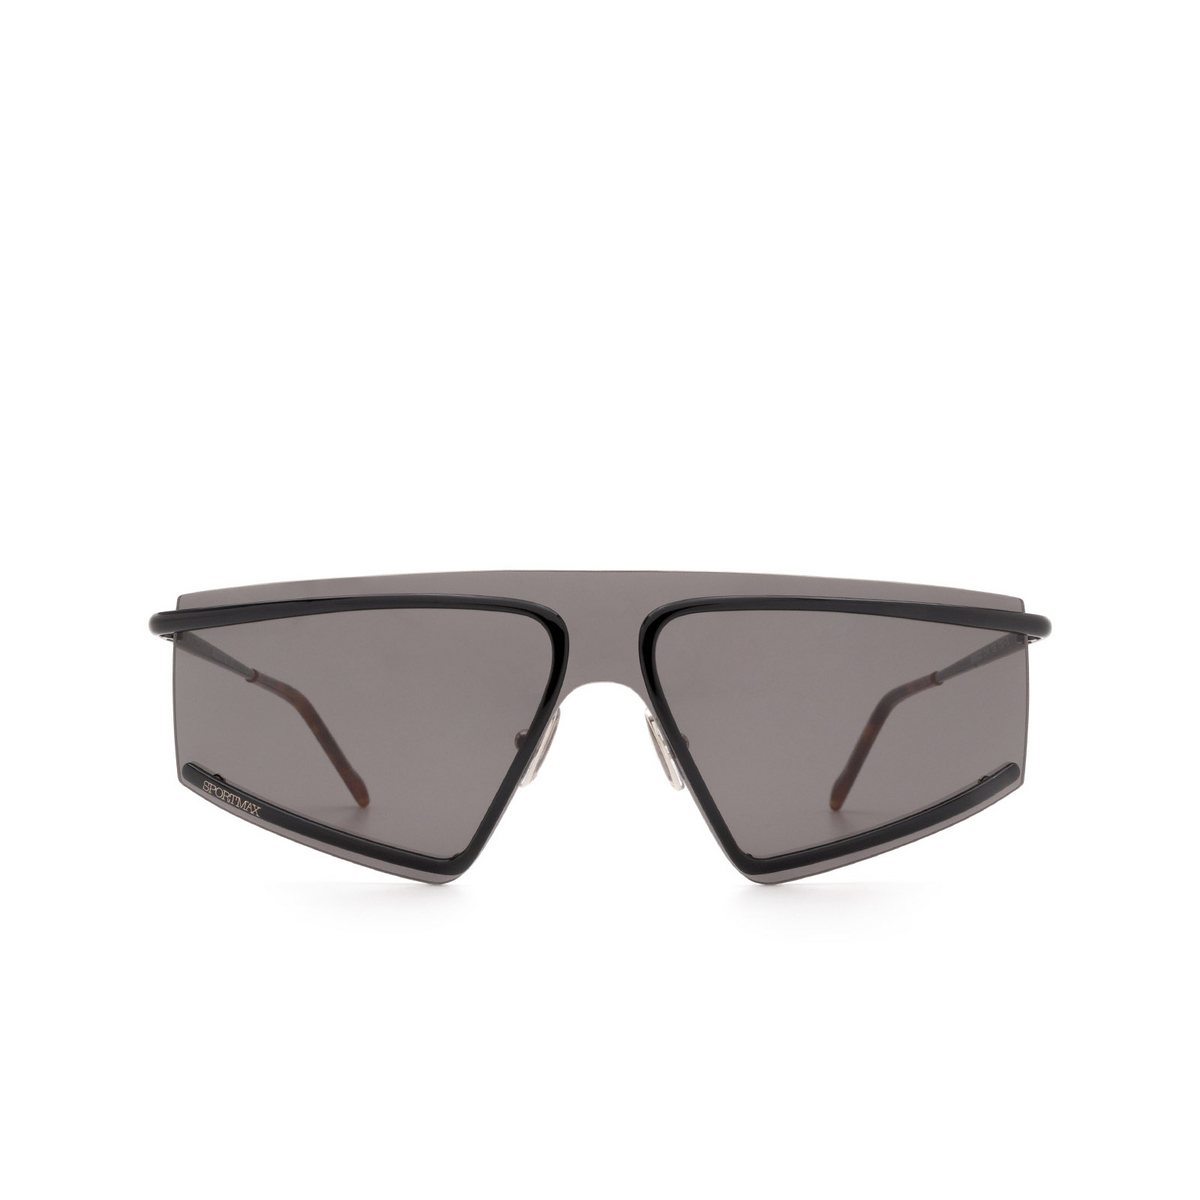 Sportmax® Mask Sunglasses: SM0023 color Shiny Black 01A - front view.